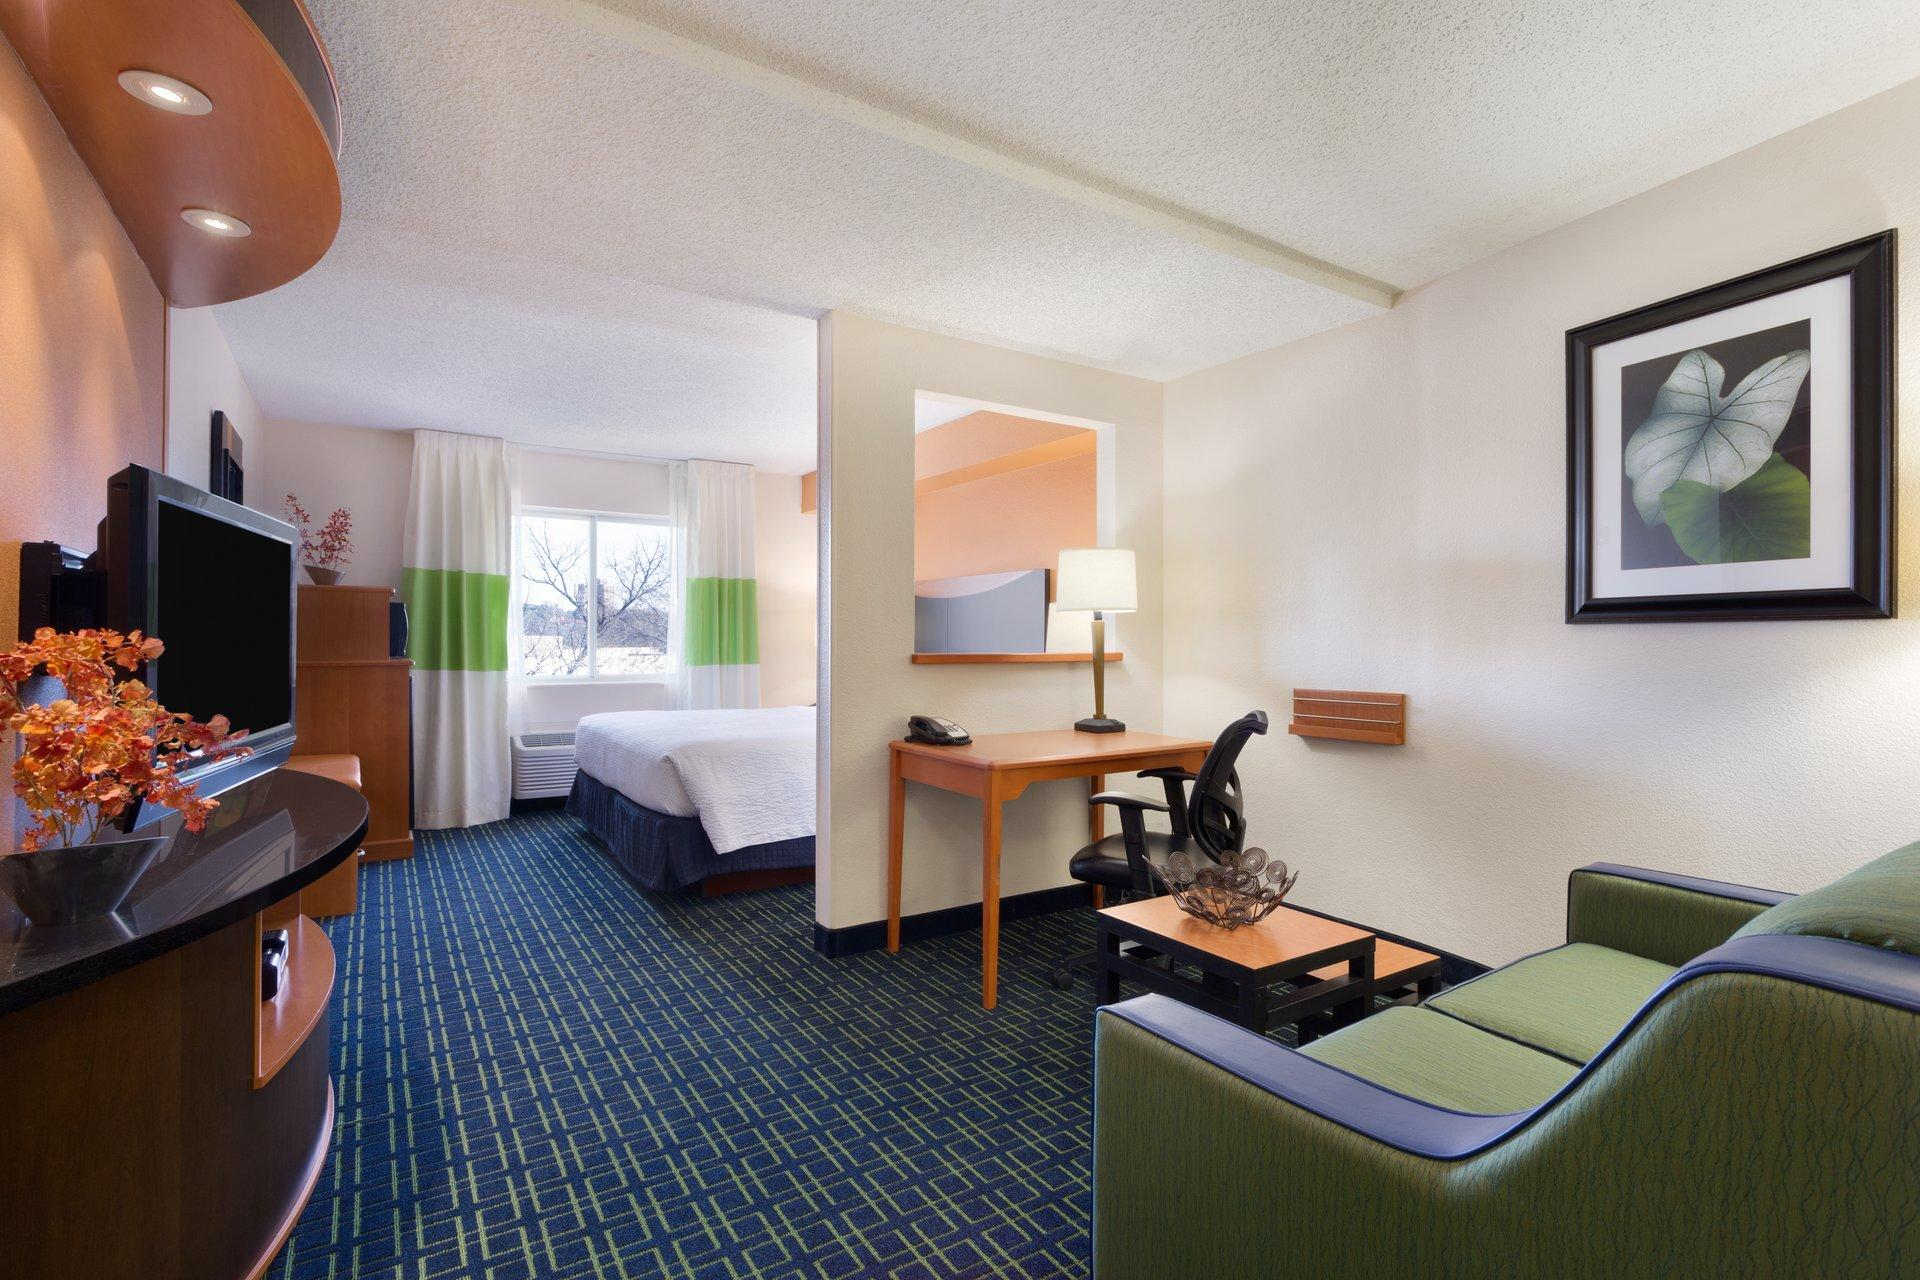 Fairfield Inn & Suites by Marriott Houston Energy Corridor/Katy Freeway image 4